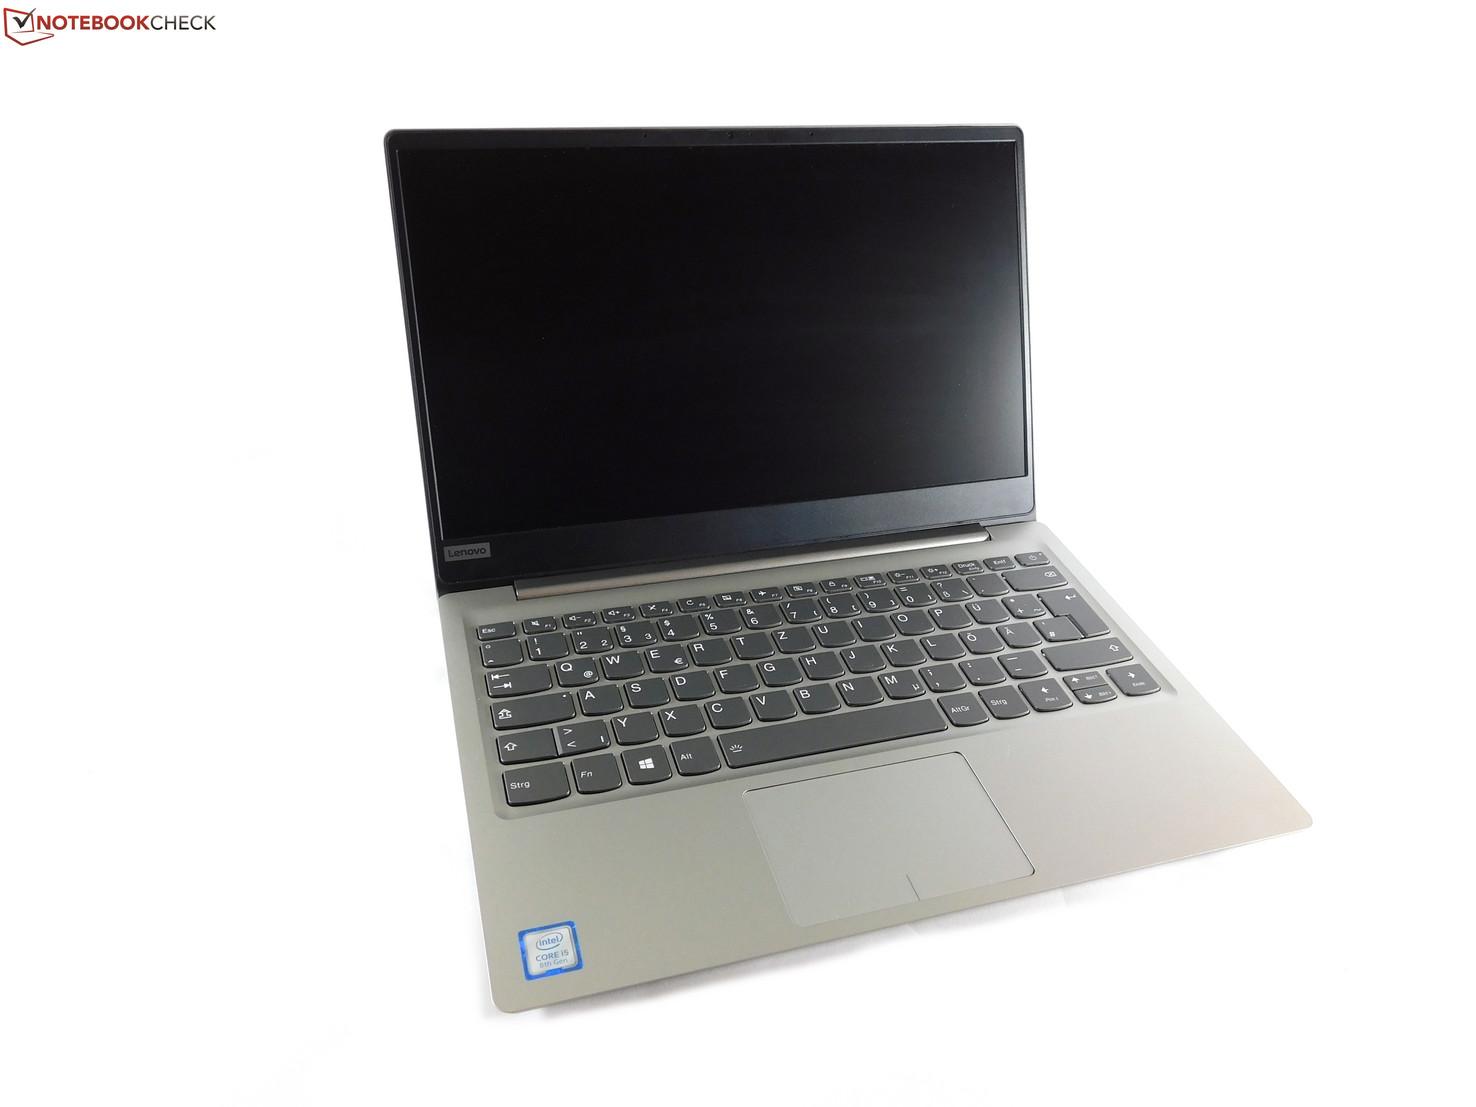 Lenovo Ideapad 320s 13ikbr I5 8250u Mx150 Laptop Review Samsung Note Edge Second Layar Shadow Full Resolution